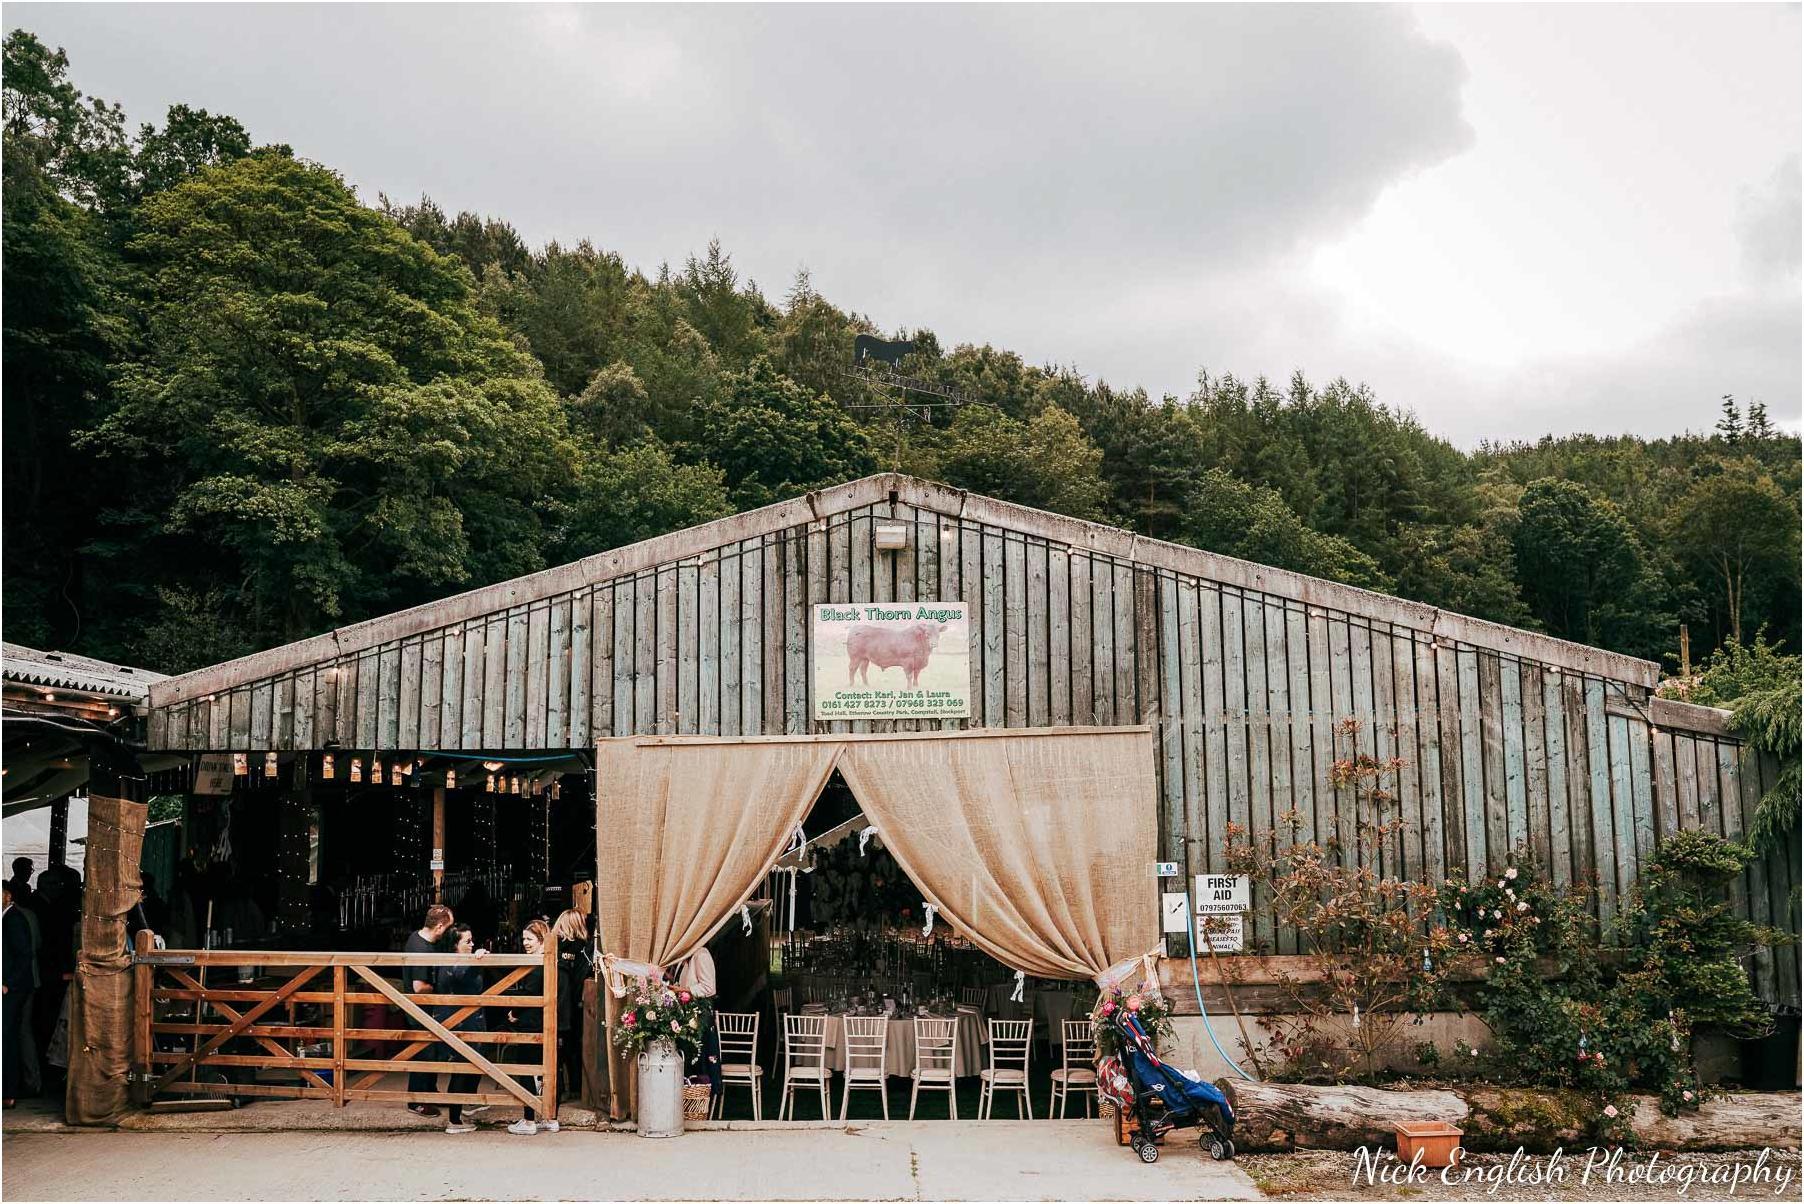 Whitebottom_Farm_Wedding_Manchester_Photograph-56.jpg